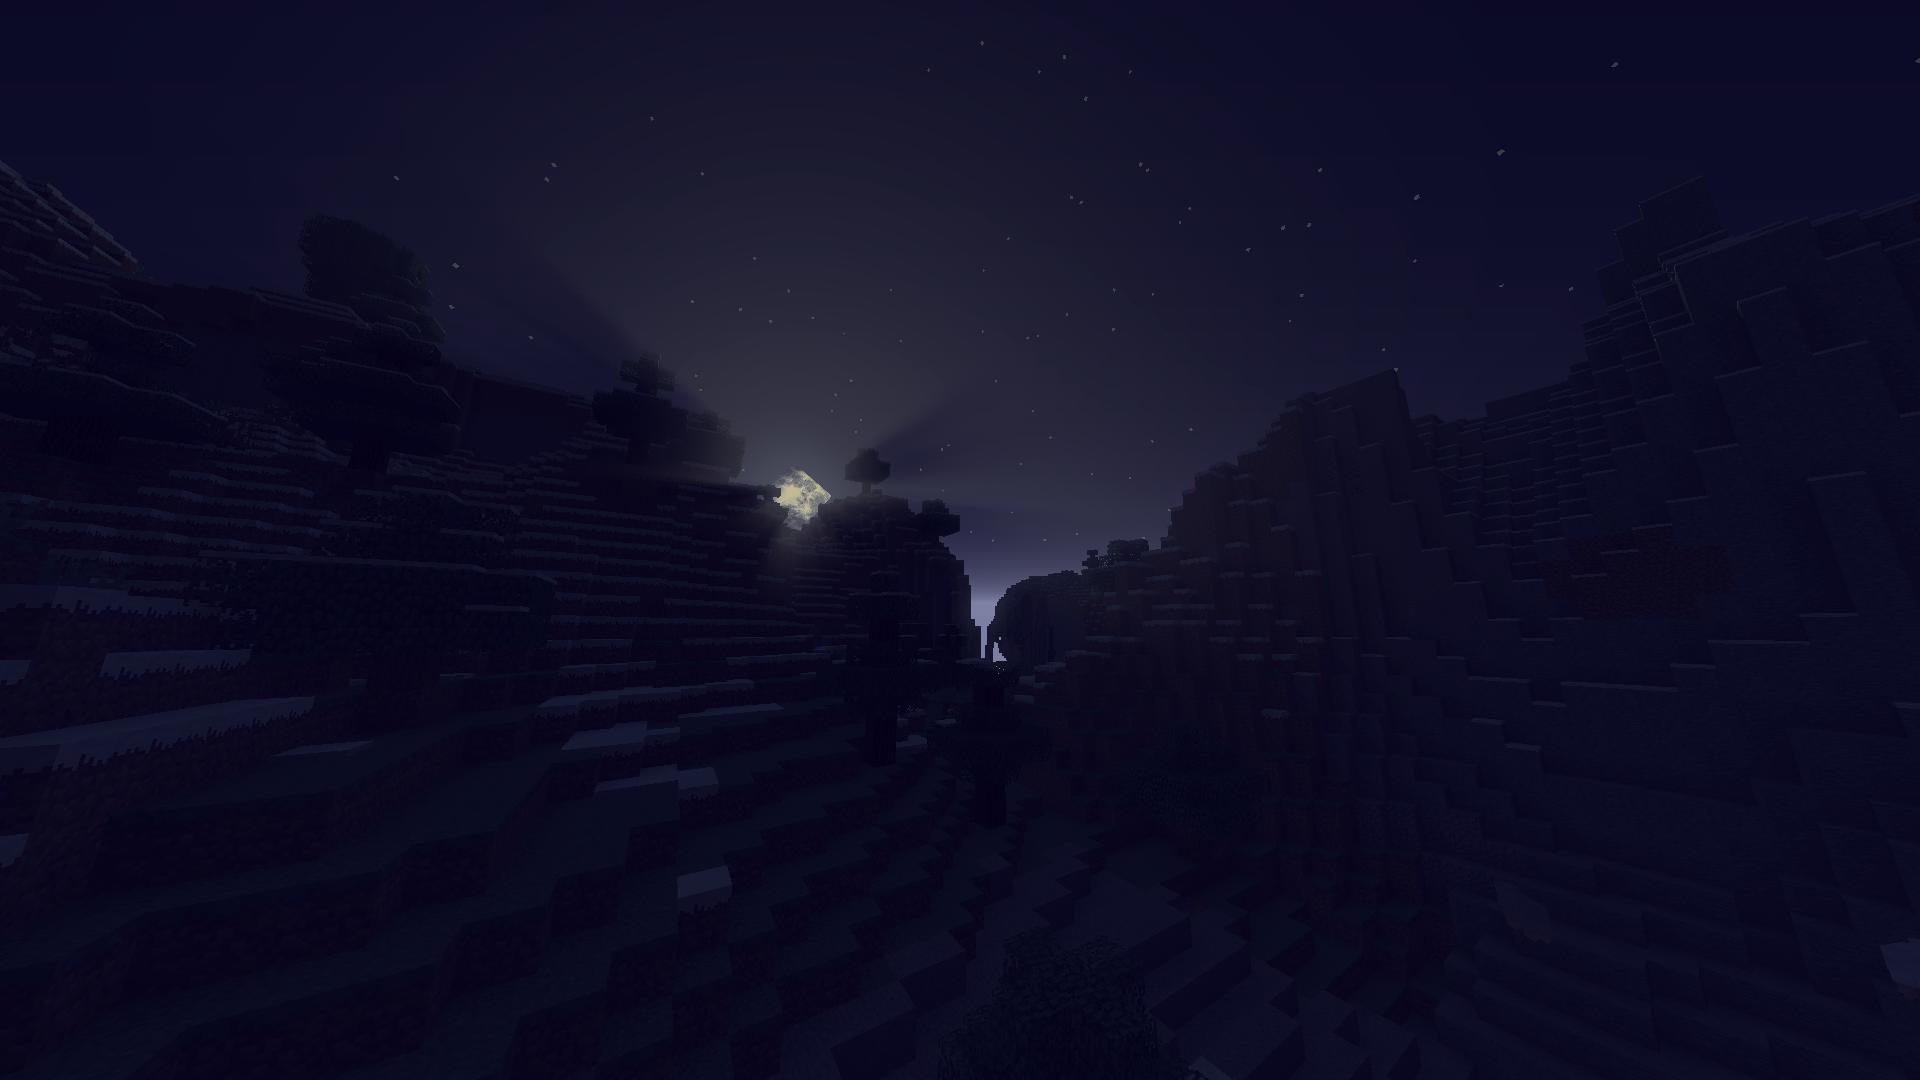 Popular Wallpaper Minecraft Night - sunlight-black-night-water-sky-Moon-Minecraft-Sun-moonlight-atmosphere-lava-dusk-shaders-midnight-Transformers-Dark-of-the-Moon-light-weather-dawn-darkness-screenshot-atmospheric-phenomenon-atmosphere-of-earth-150571  Gallery_833538.png